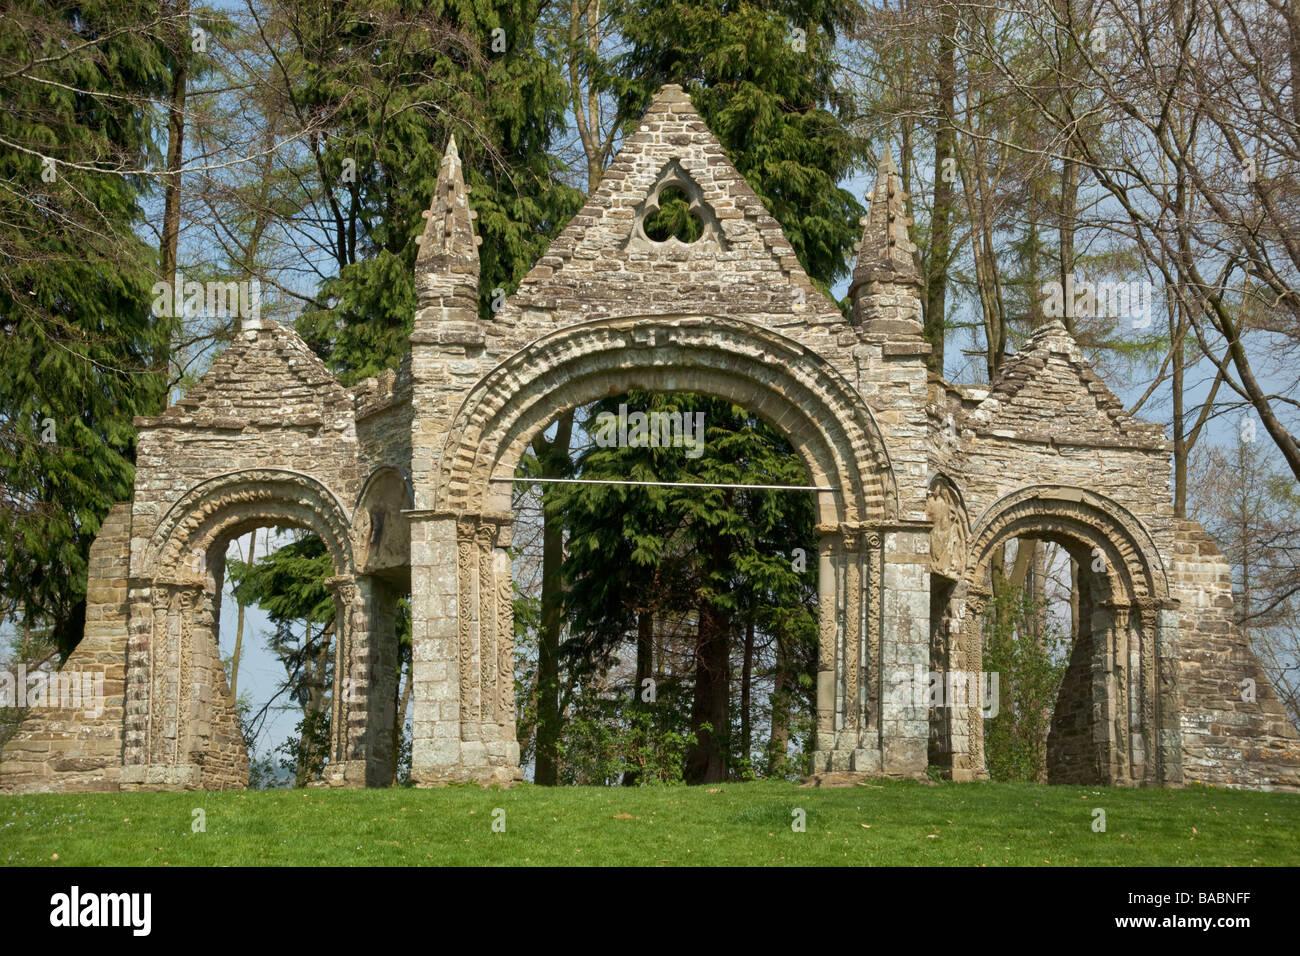 Shobdon Arches A Gothic Archway In Herefordshire